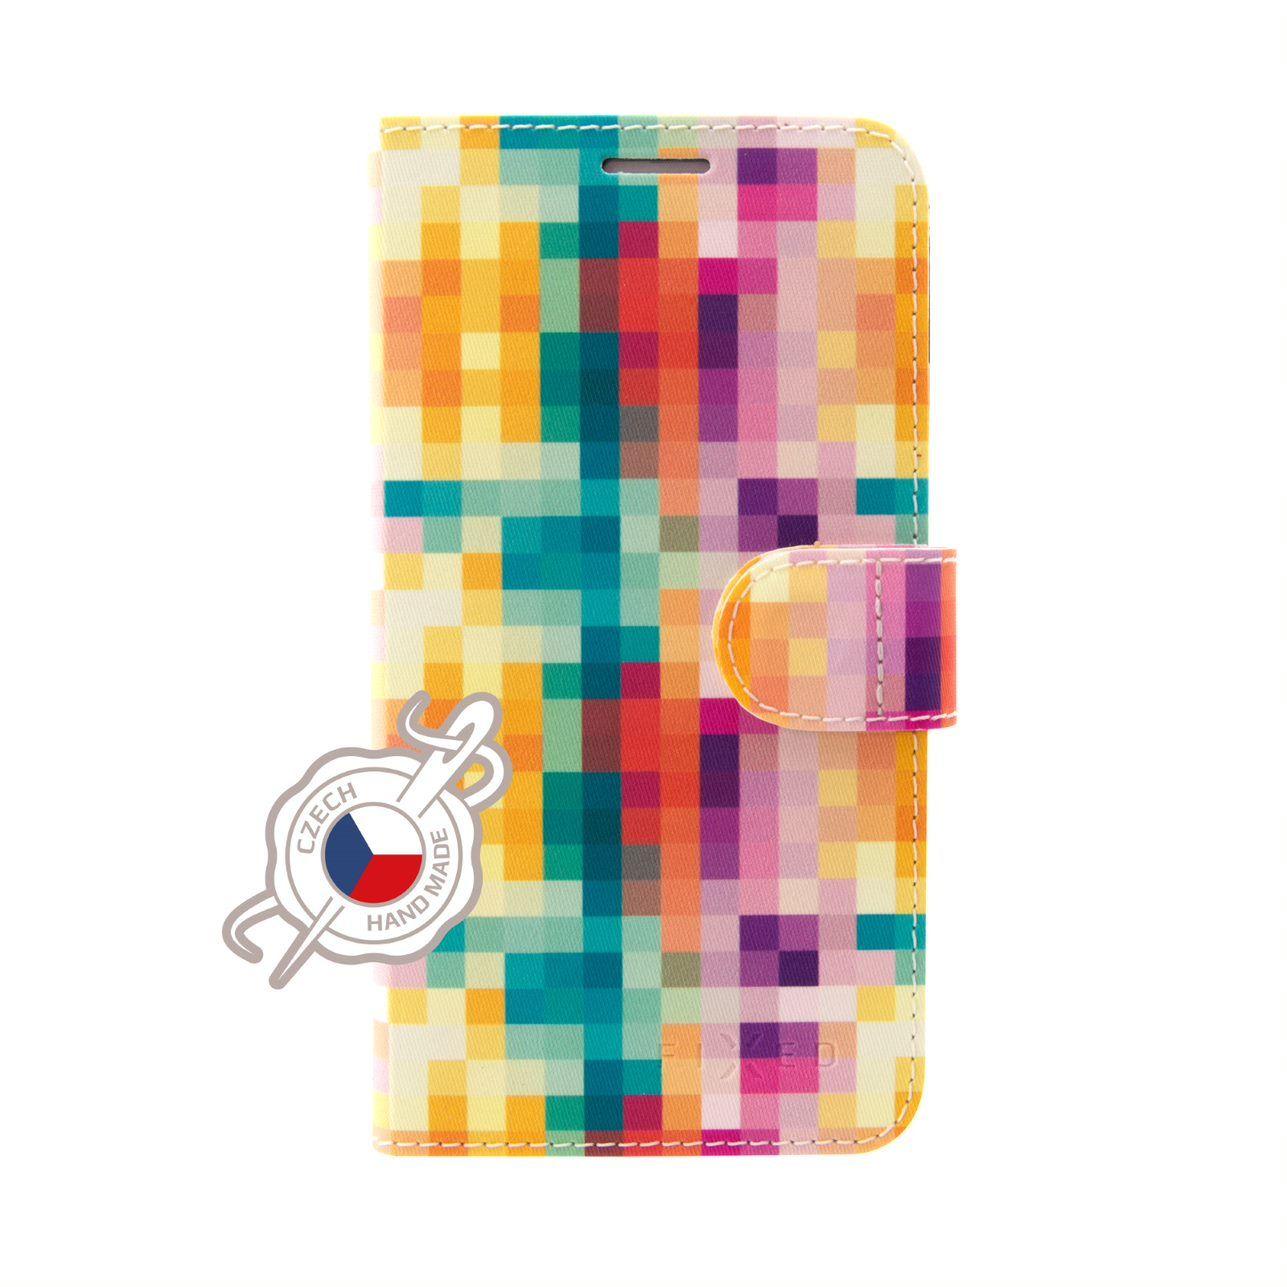 FIXED FIT flipové pouzdro pro Xiaomi Redmi Note 7/7 Pro, motiv Dice